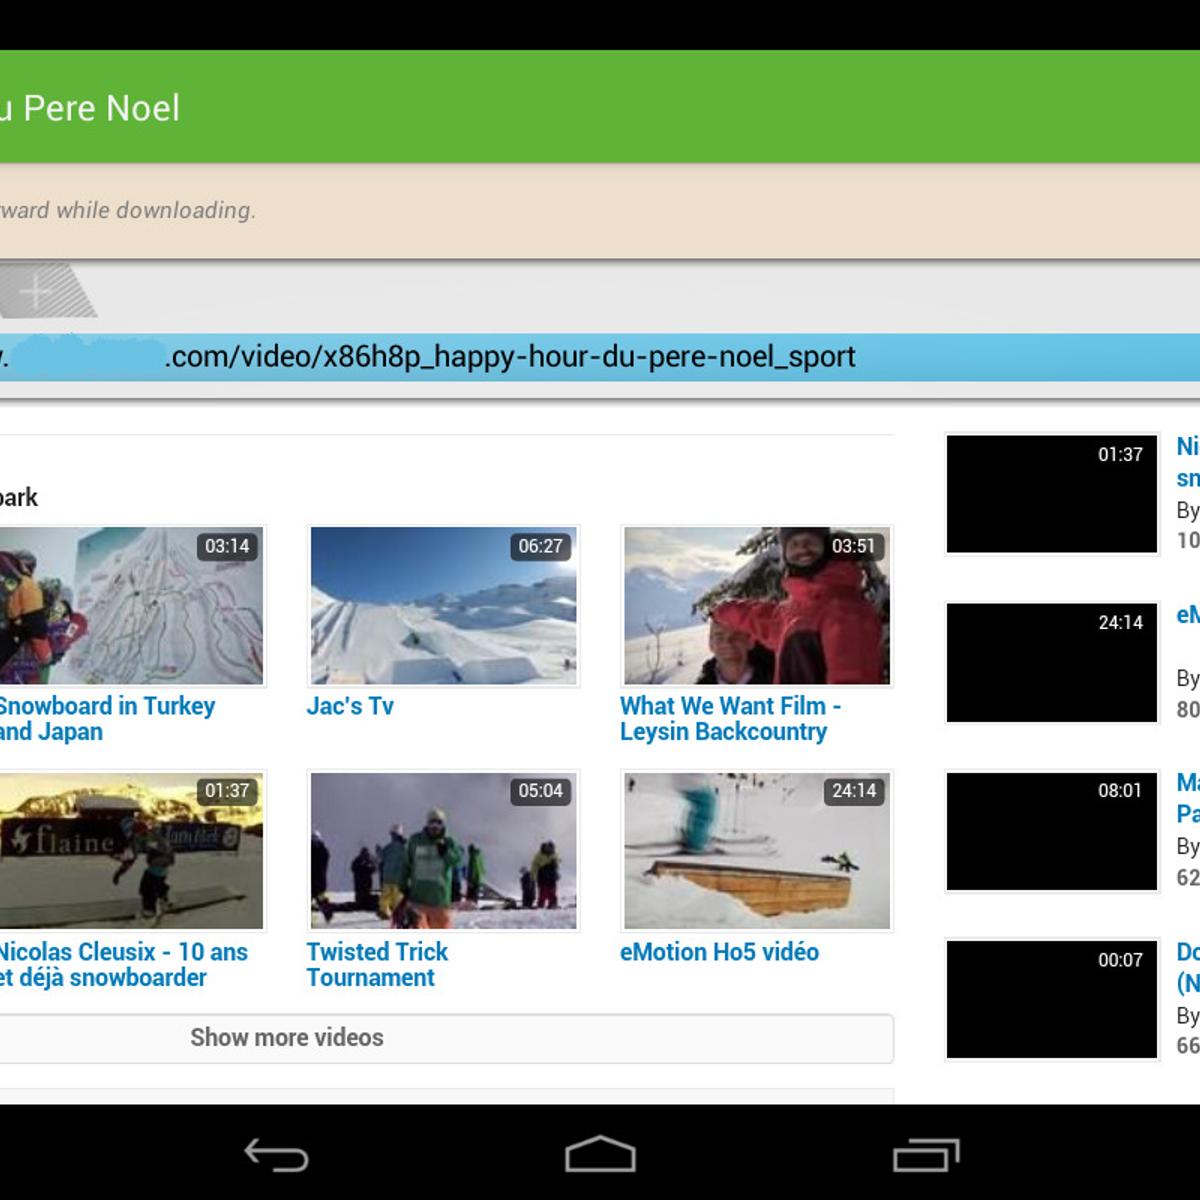 AVD Video Downloader Alternatives and Similar Apps